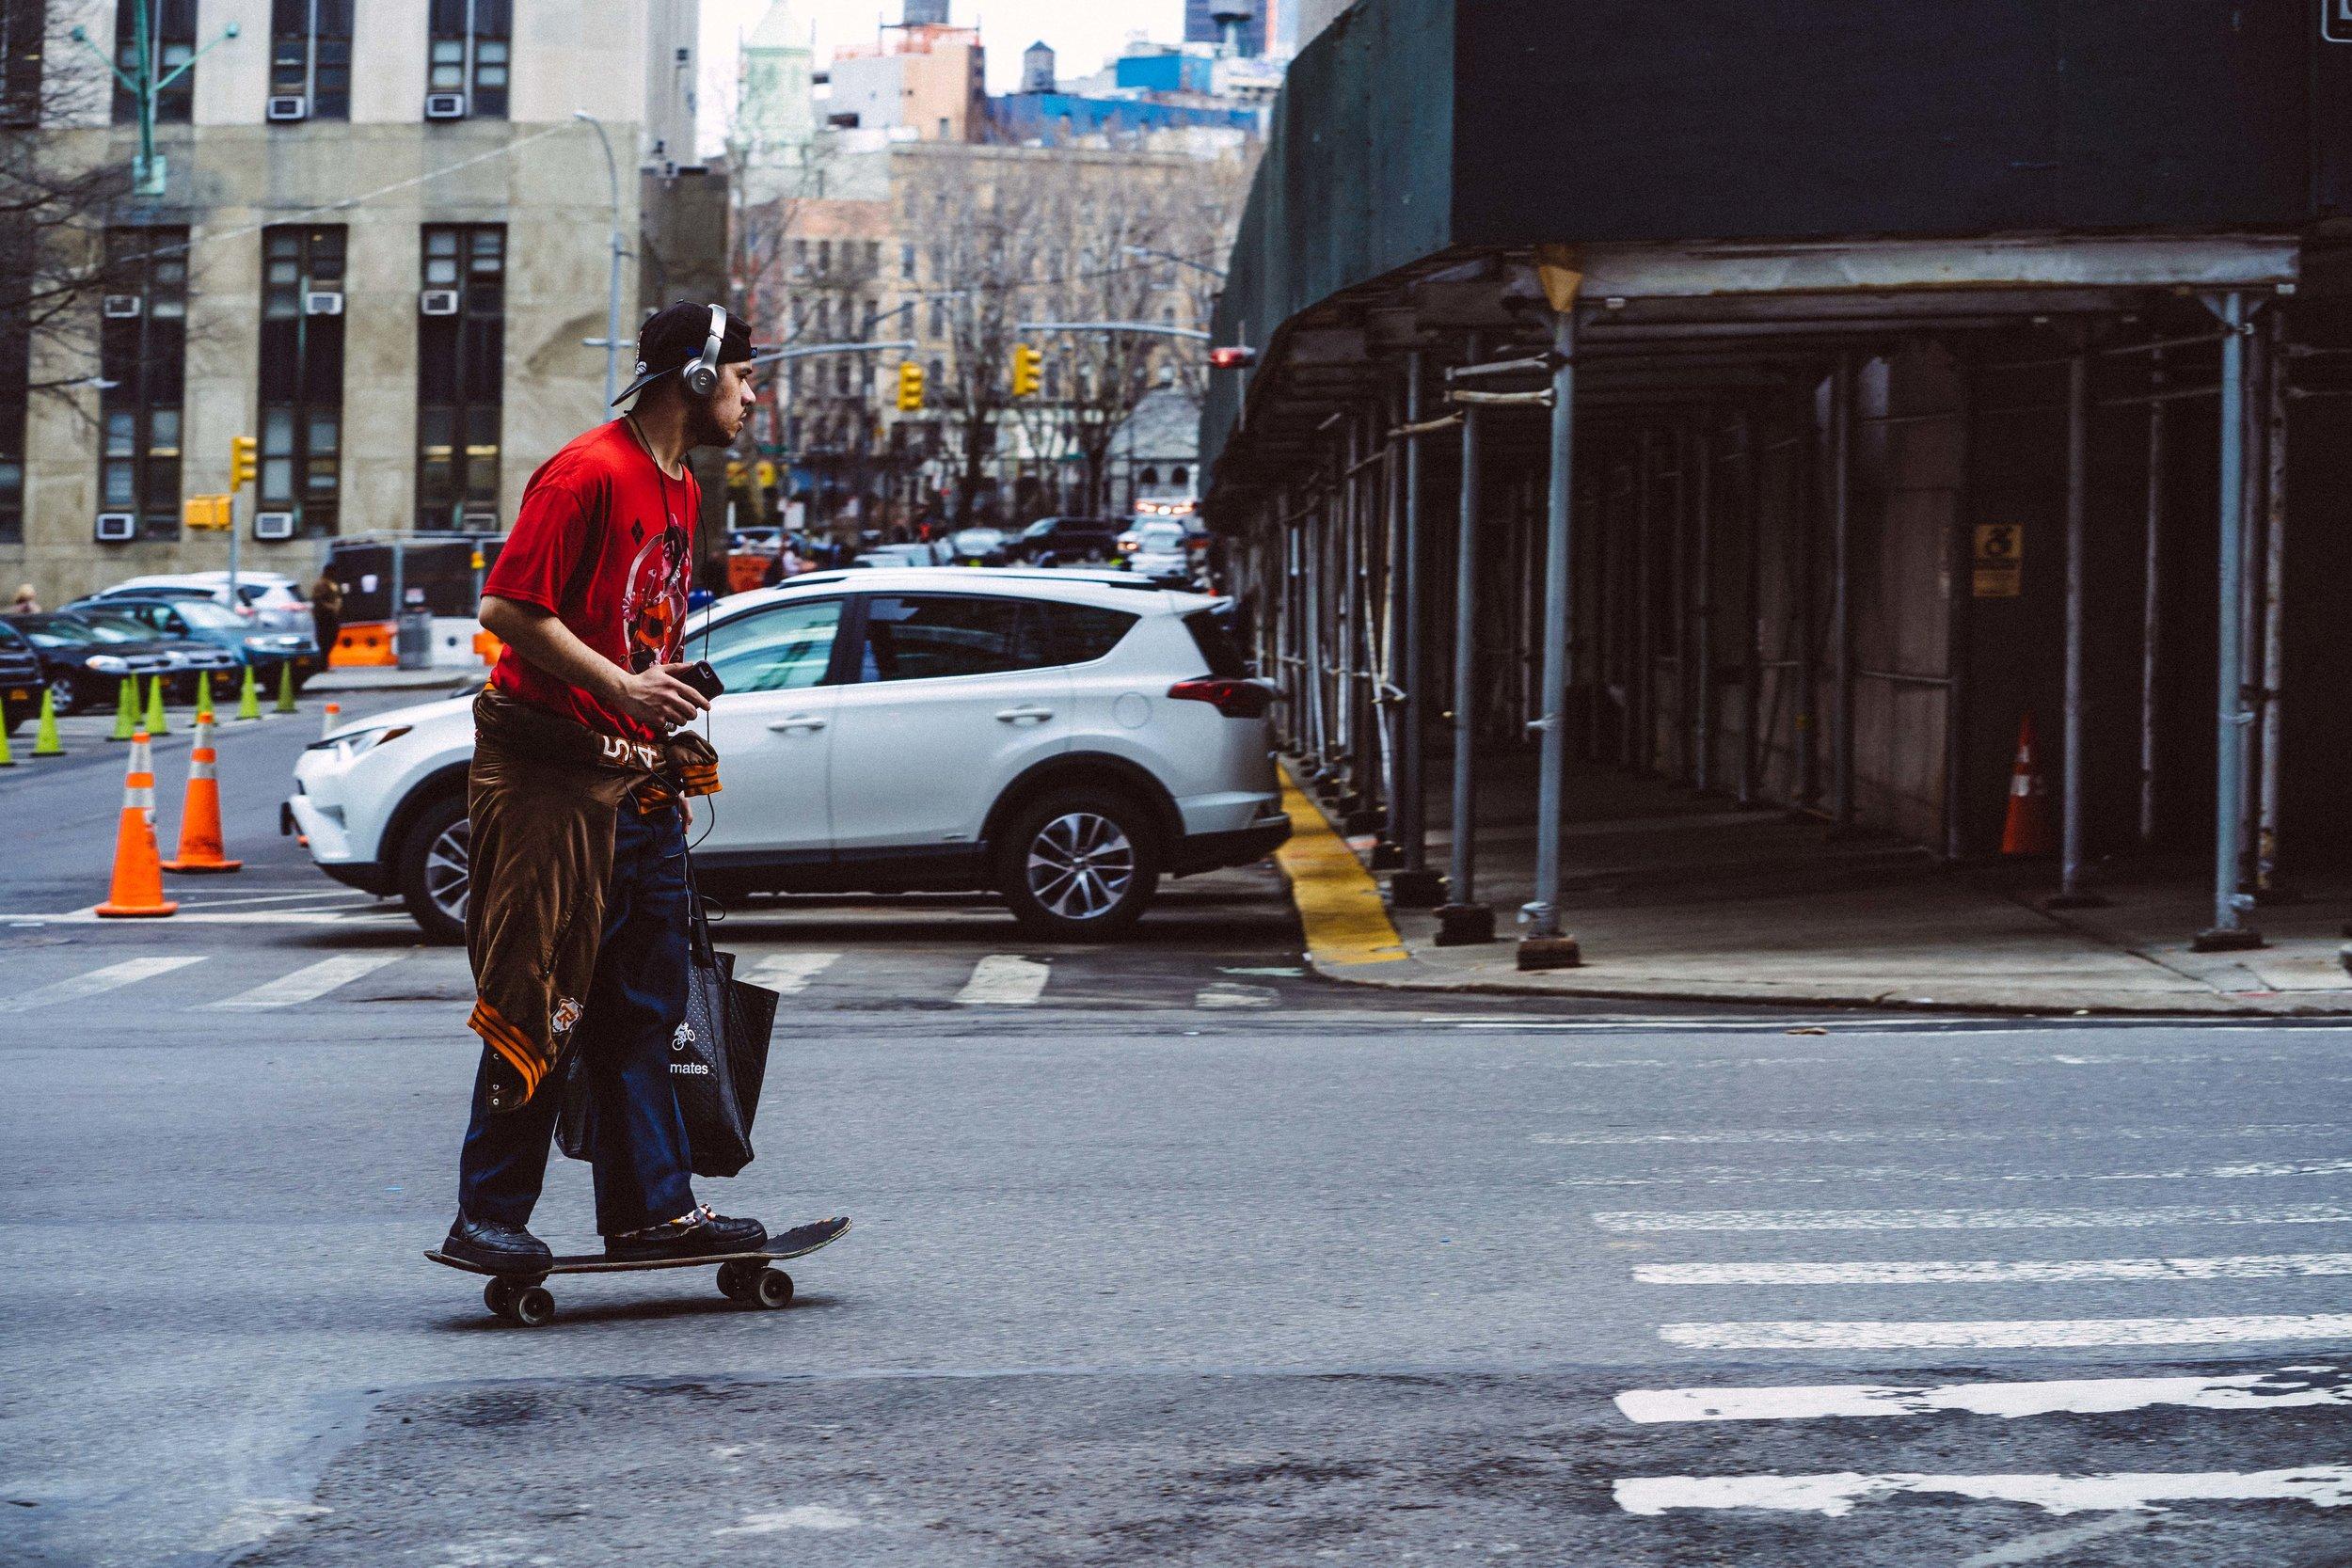 newyork-sony-102378.jpg